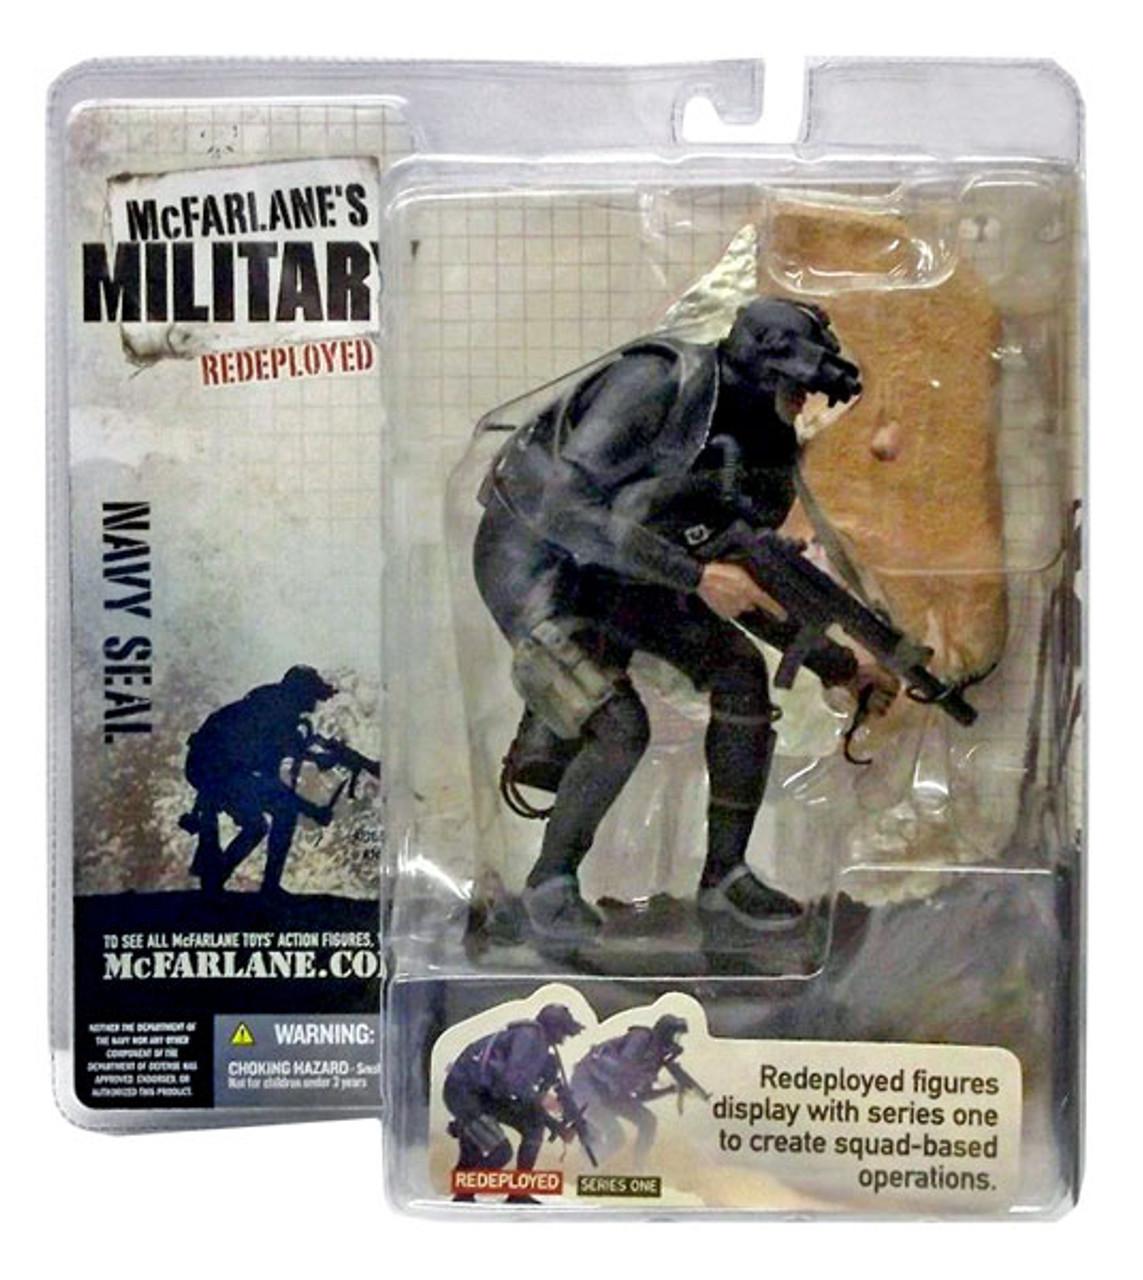 McFarlane Toys Military Redeployed Series 1 Navy Seal Action Figure [Random Ethnicity]